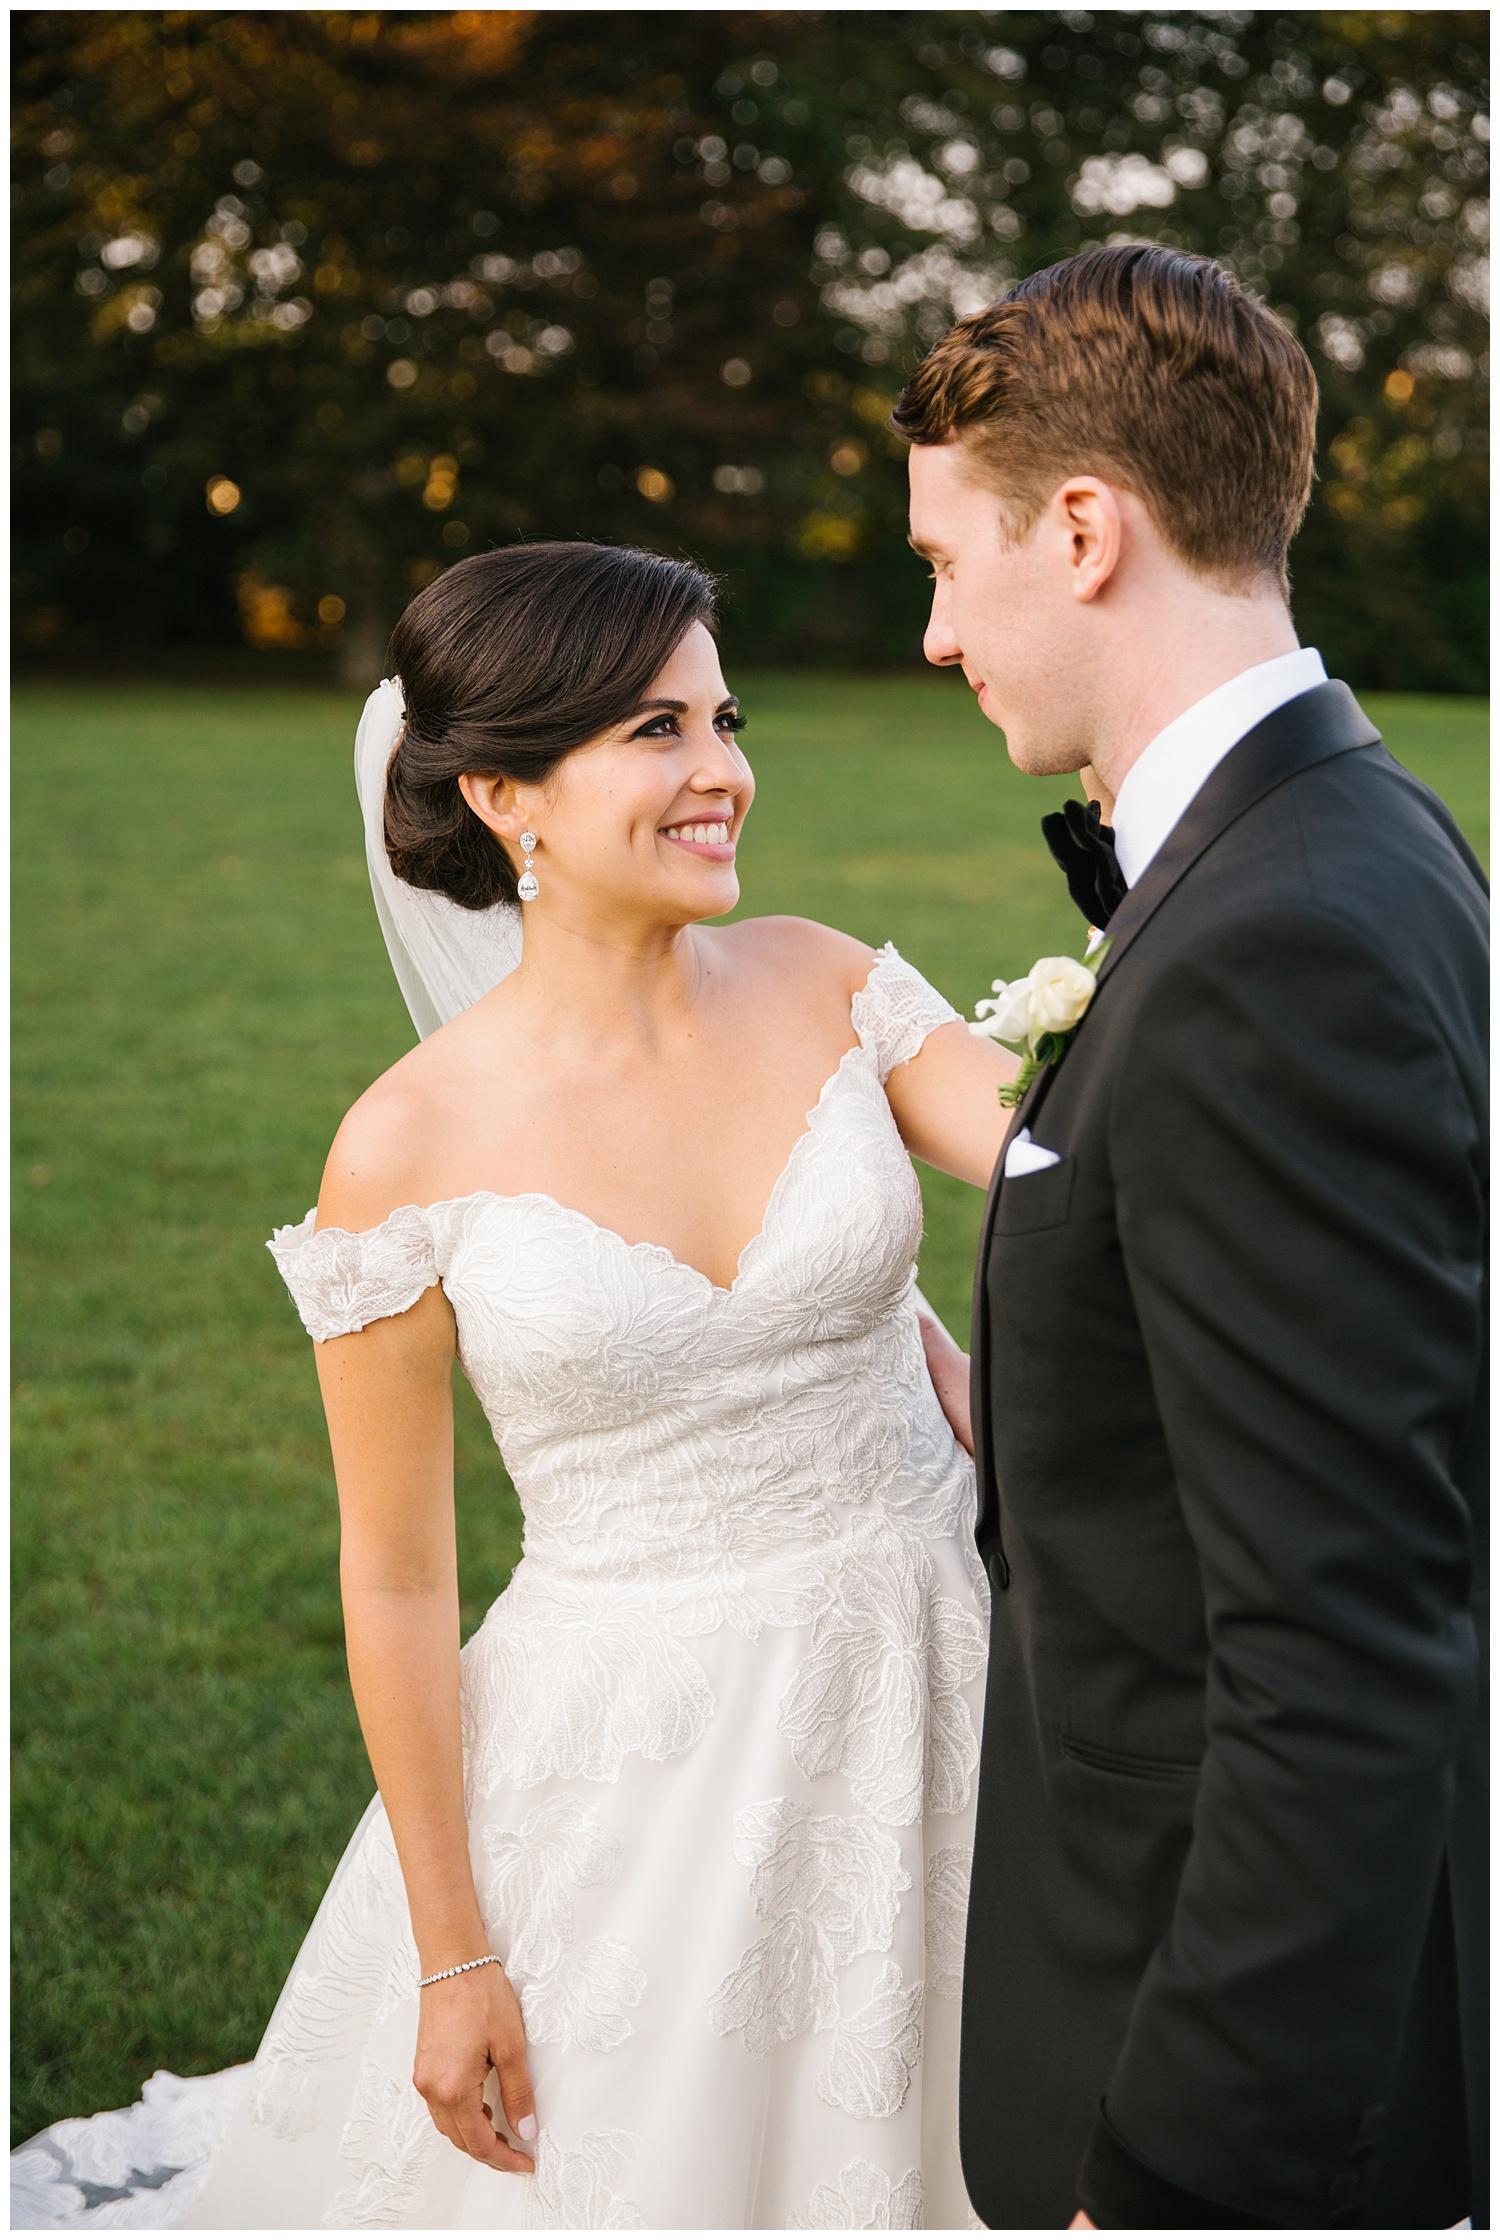 Stephen_Nathalie_Rosecliff_Mansion_Wedding_022.jpeg